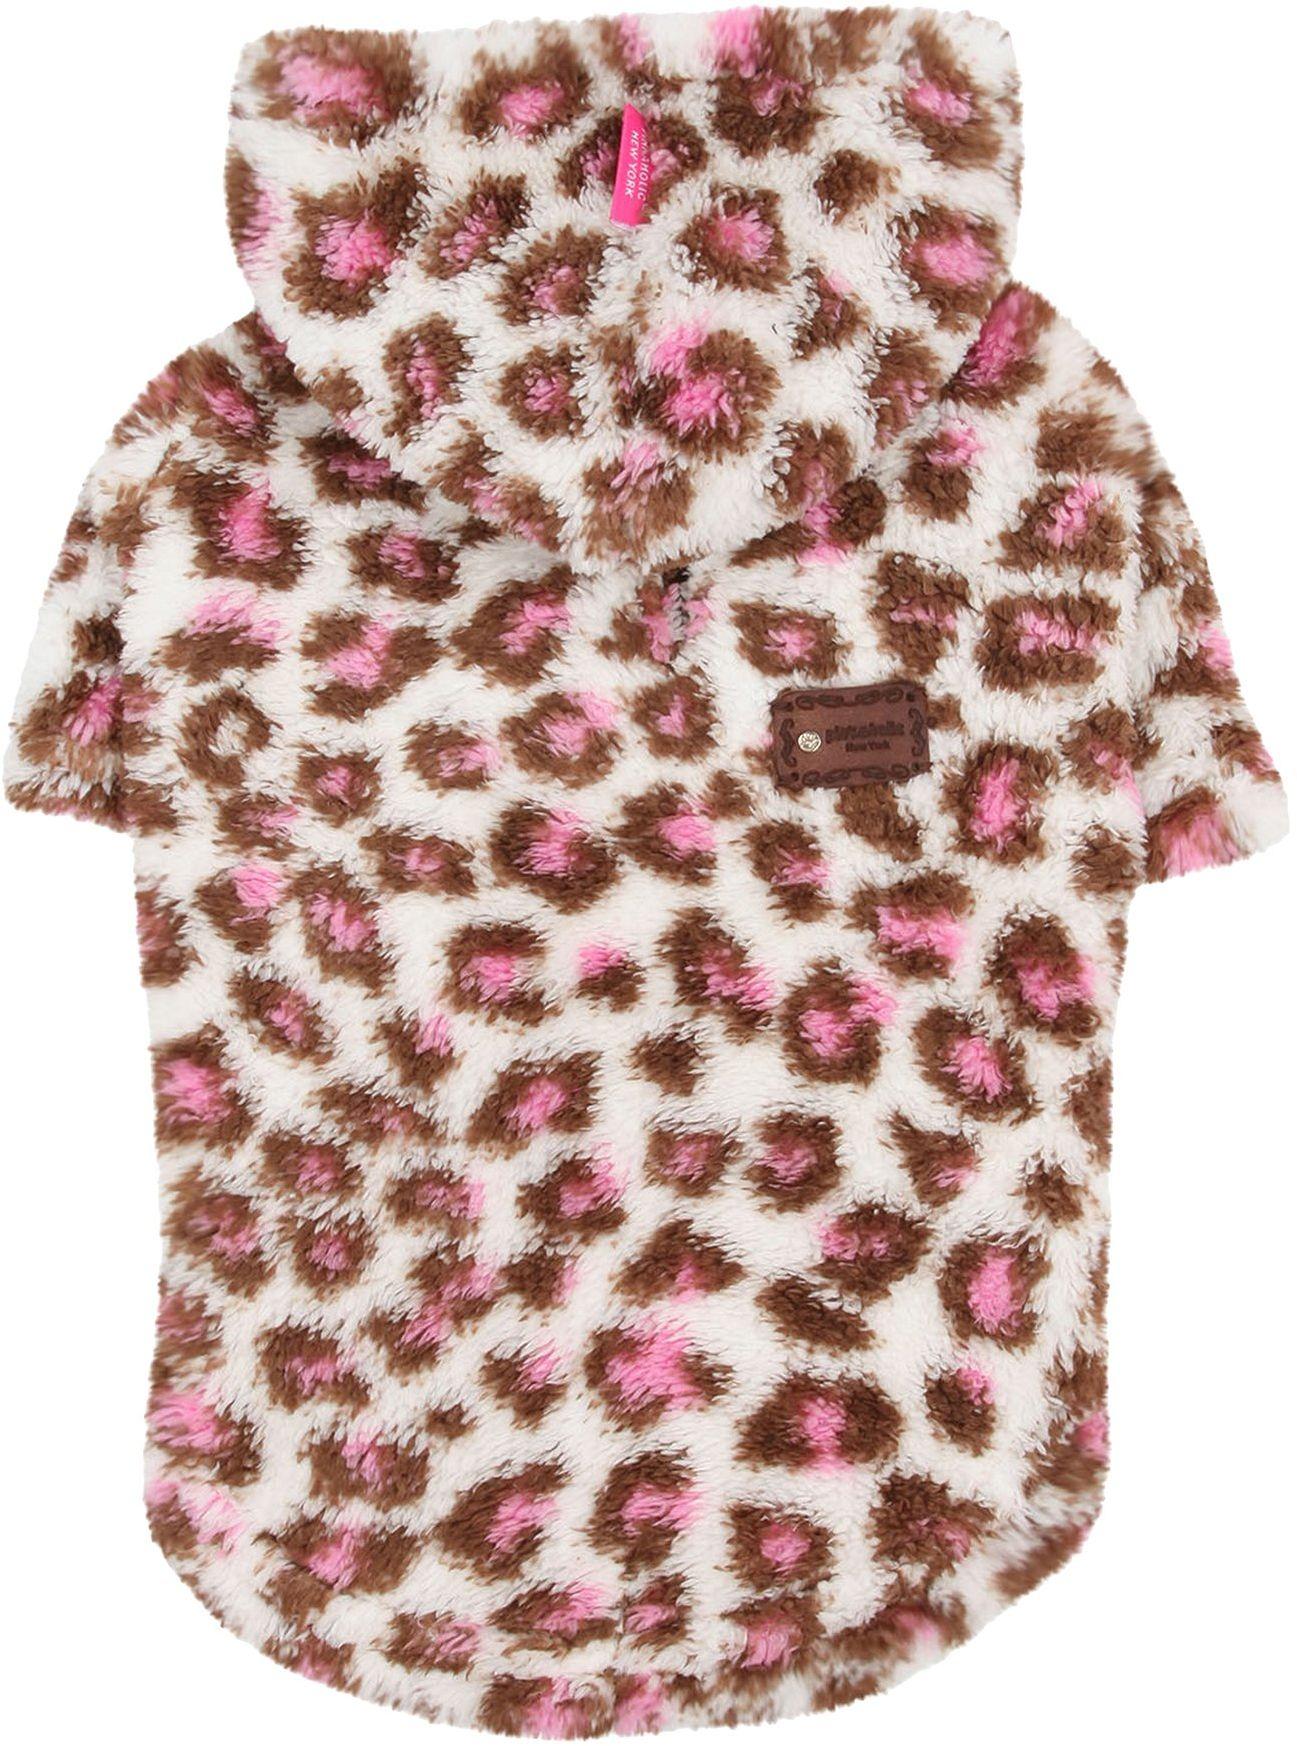 Pinkaholic New York NAOD-TS7078 Leopup Sweater, XL, różowy